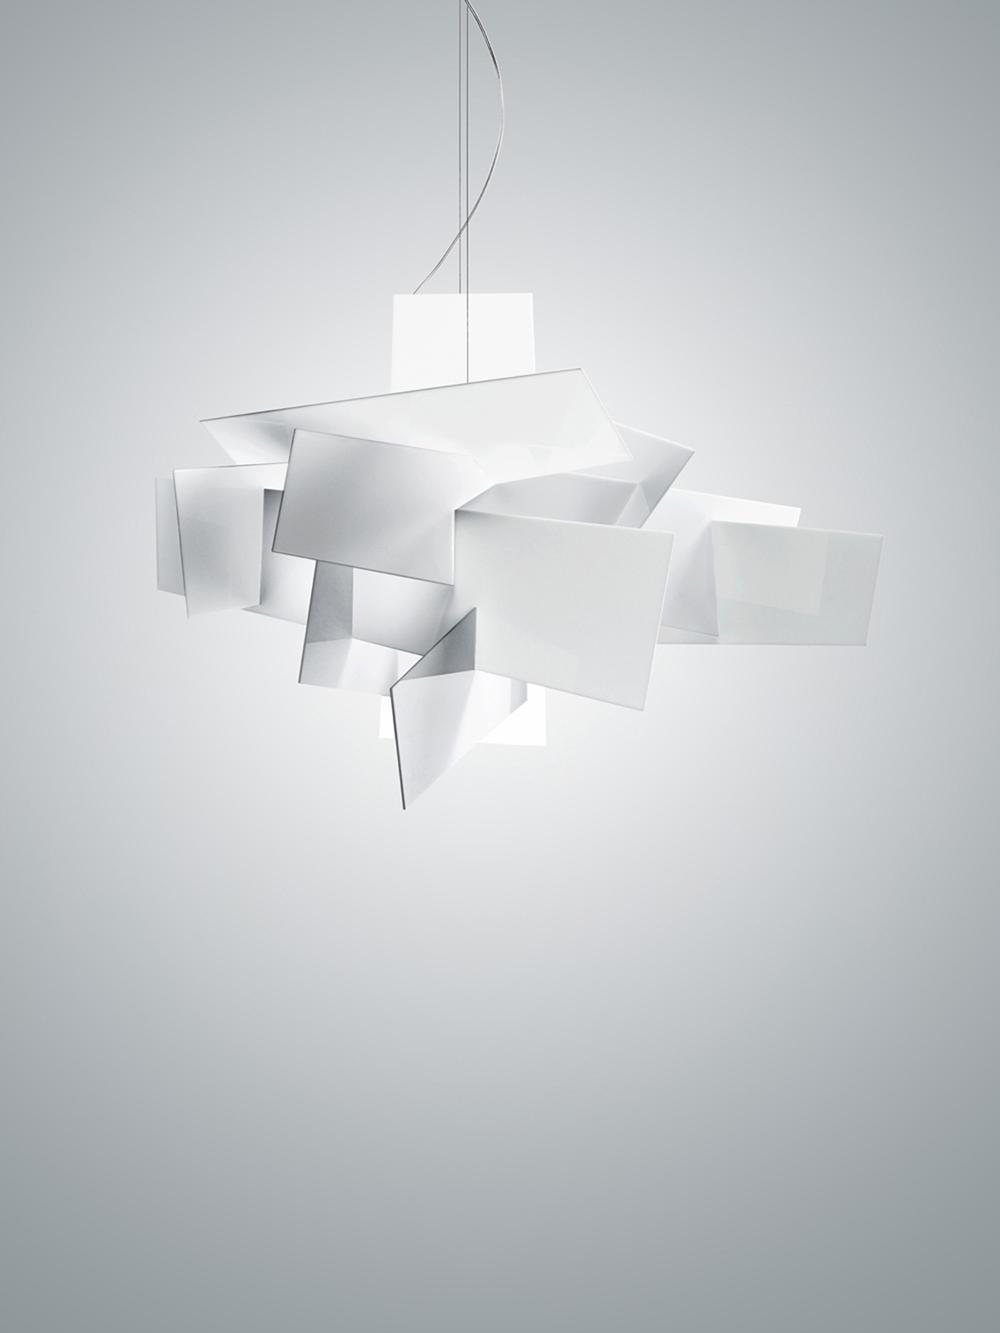 foscarini big bang suspension light buy from campbell watson uk. Black Bedroom Furniture Sets. Home Design Ideas